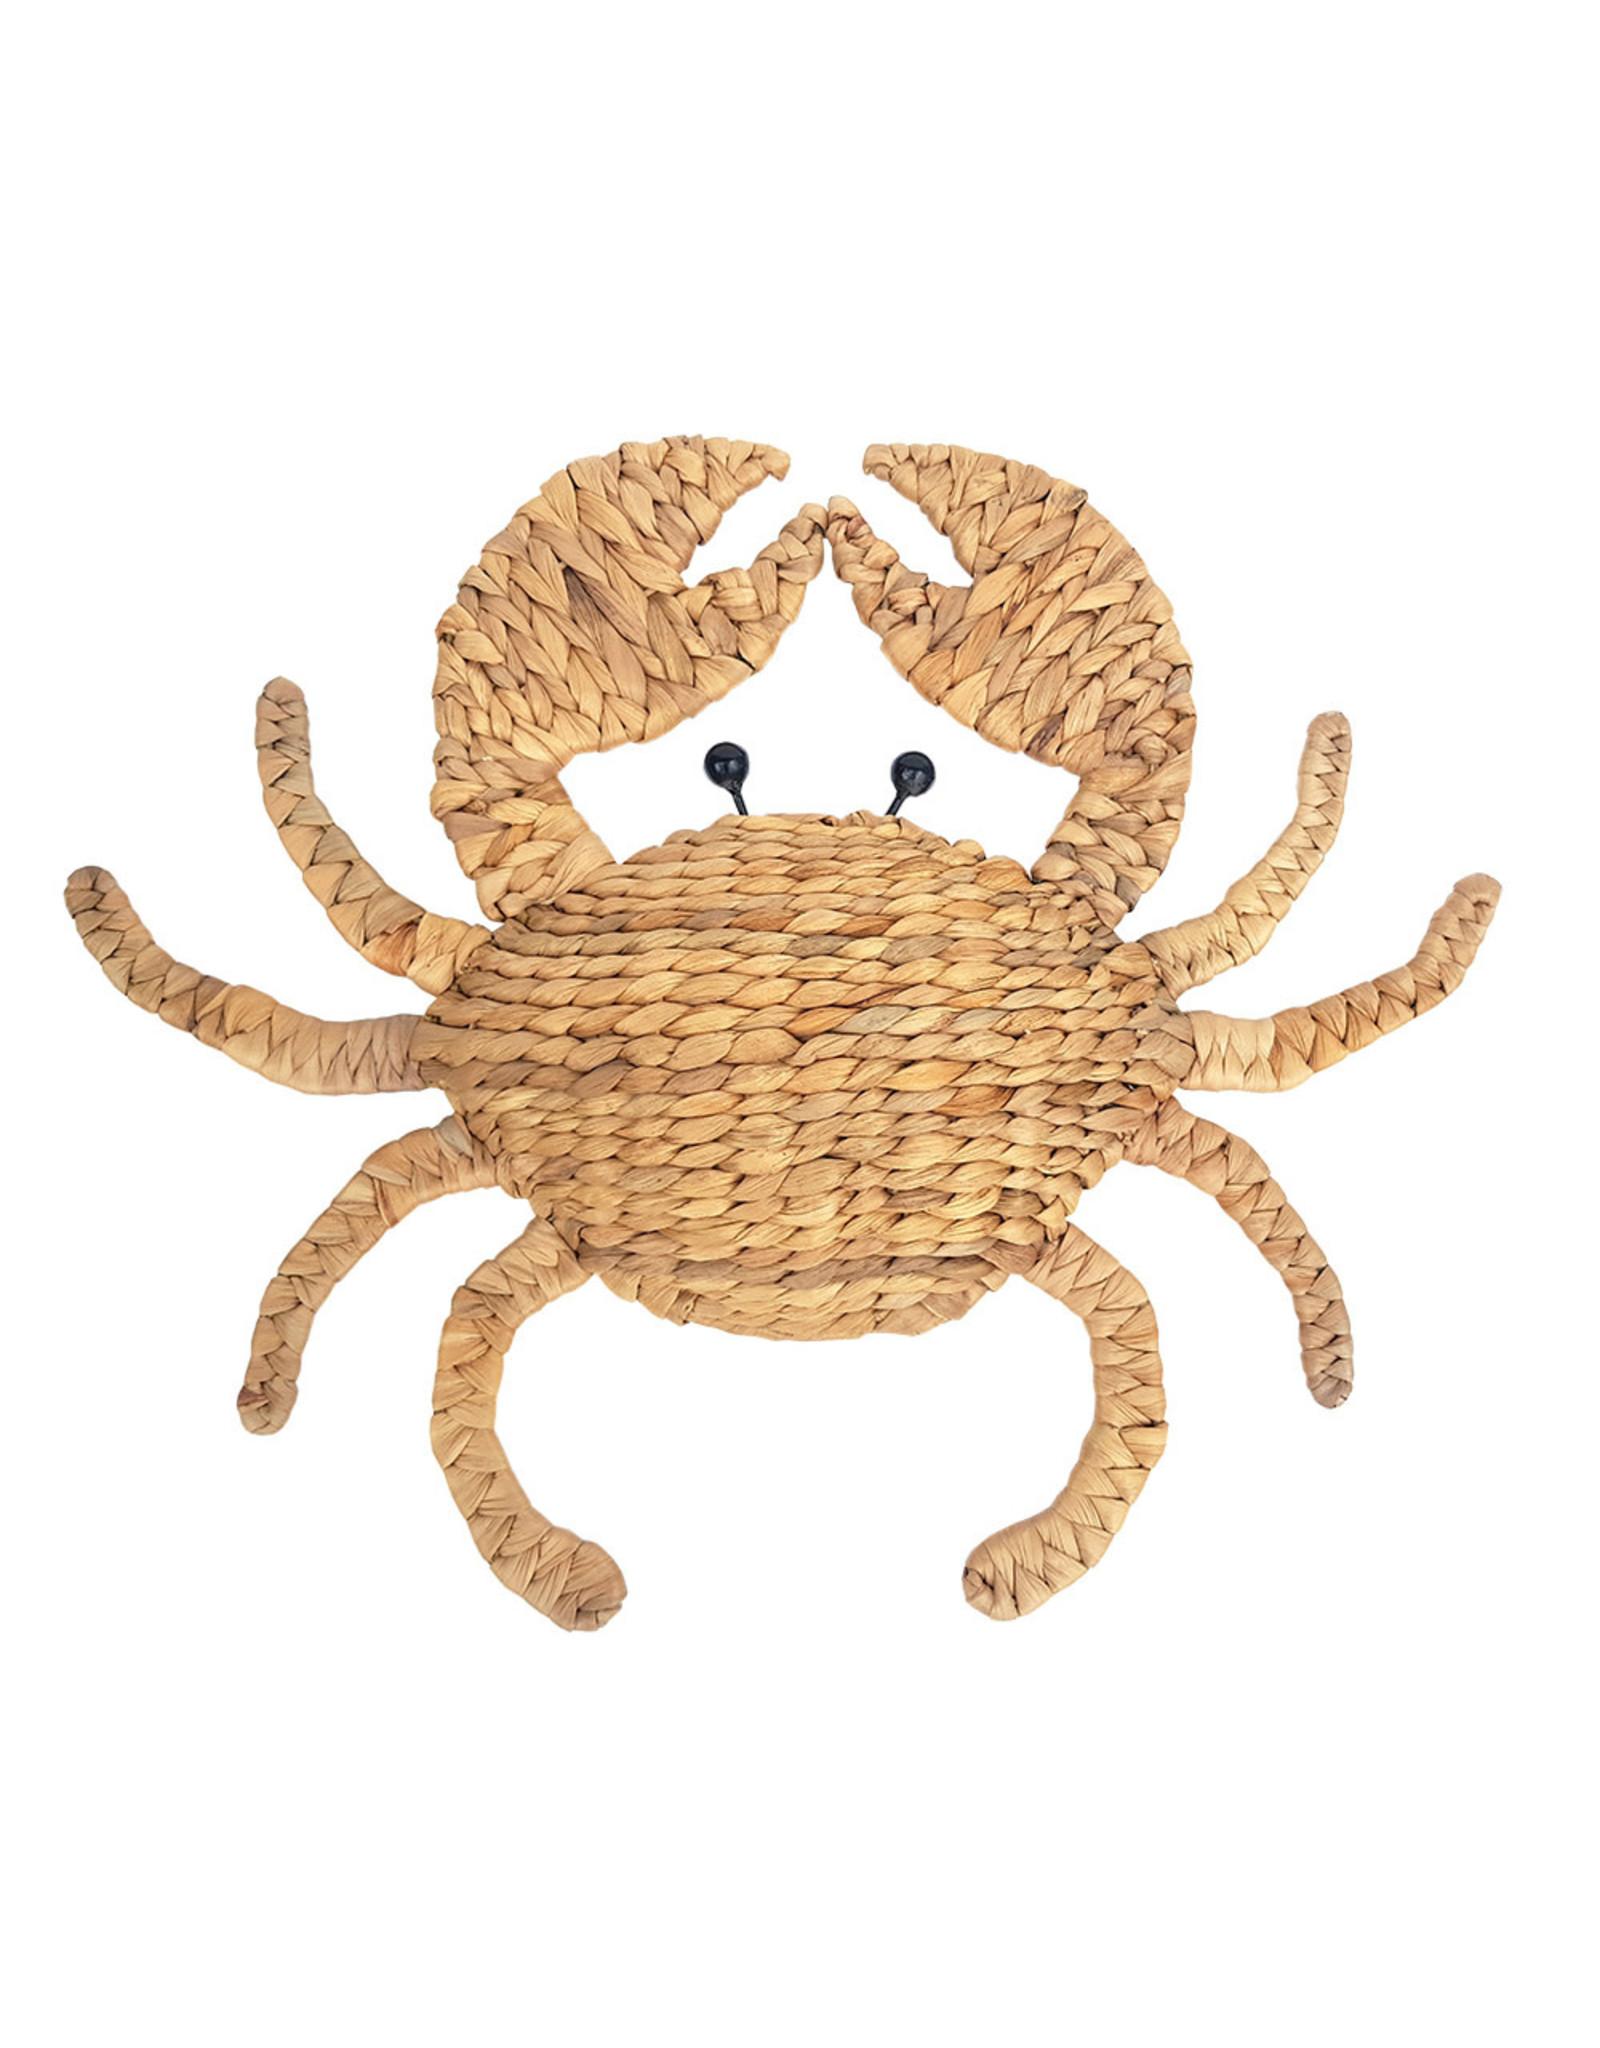 Crab Woven Wall Hanging